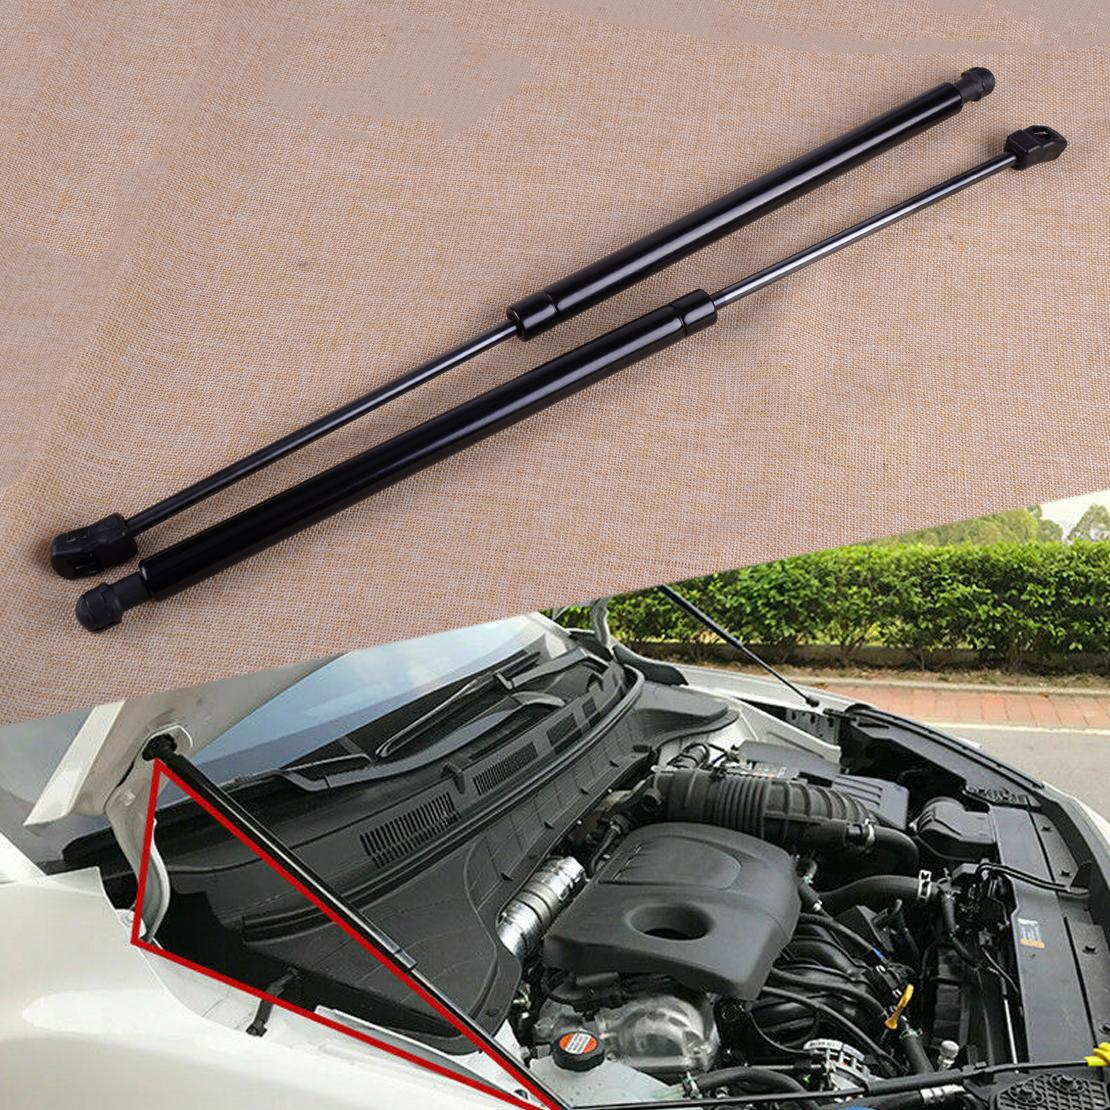 2Pcs Front Bonnet Hood Lift Support Struts Fit for Hyundai Kona 2017-2019